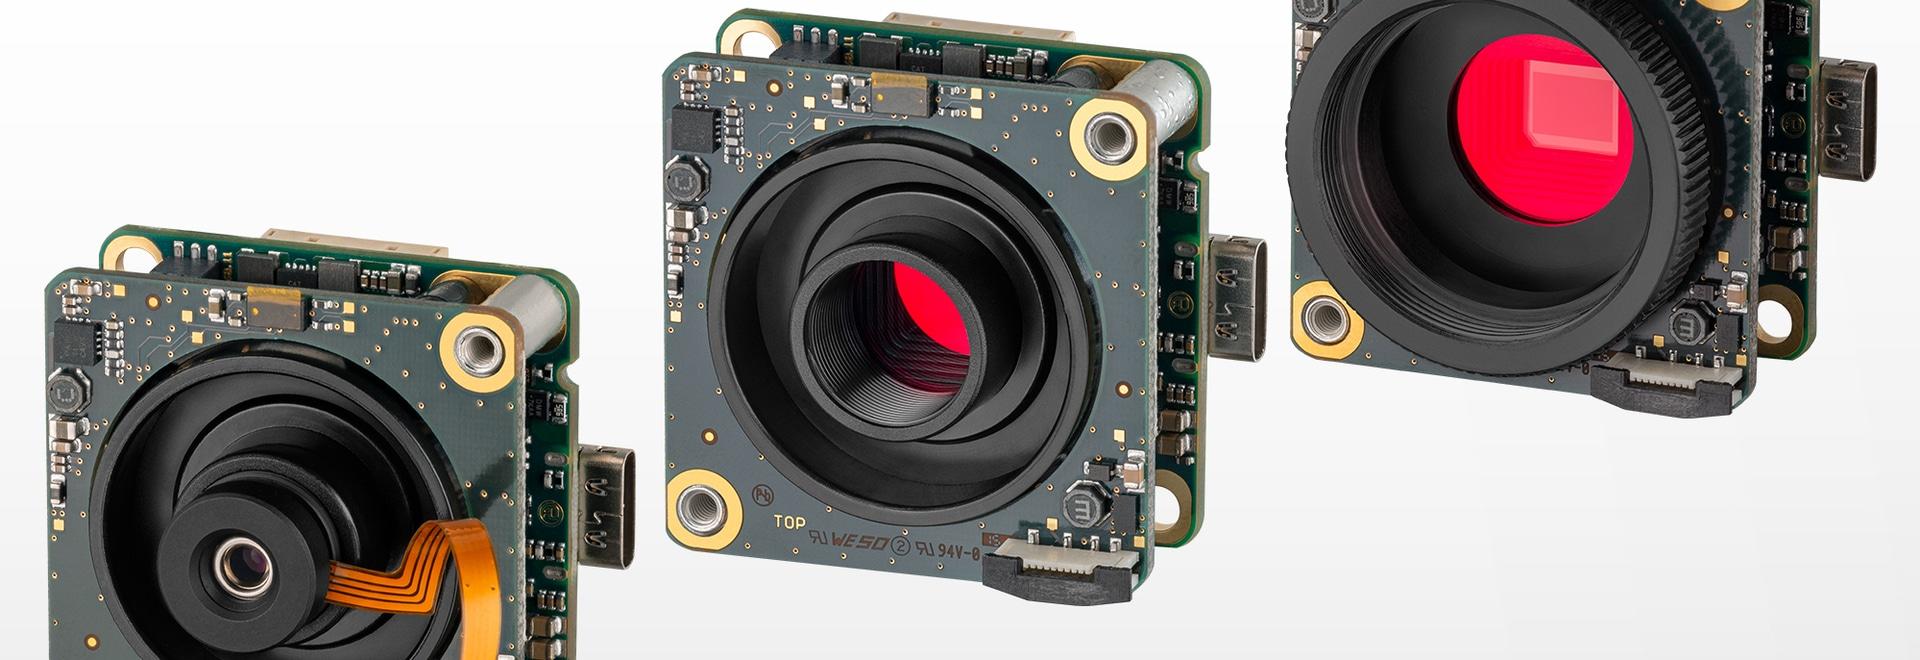 uEye LE AF camera models